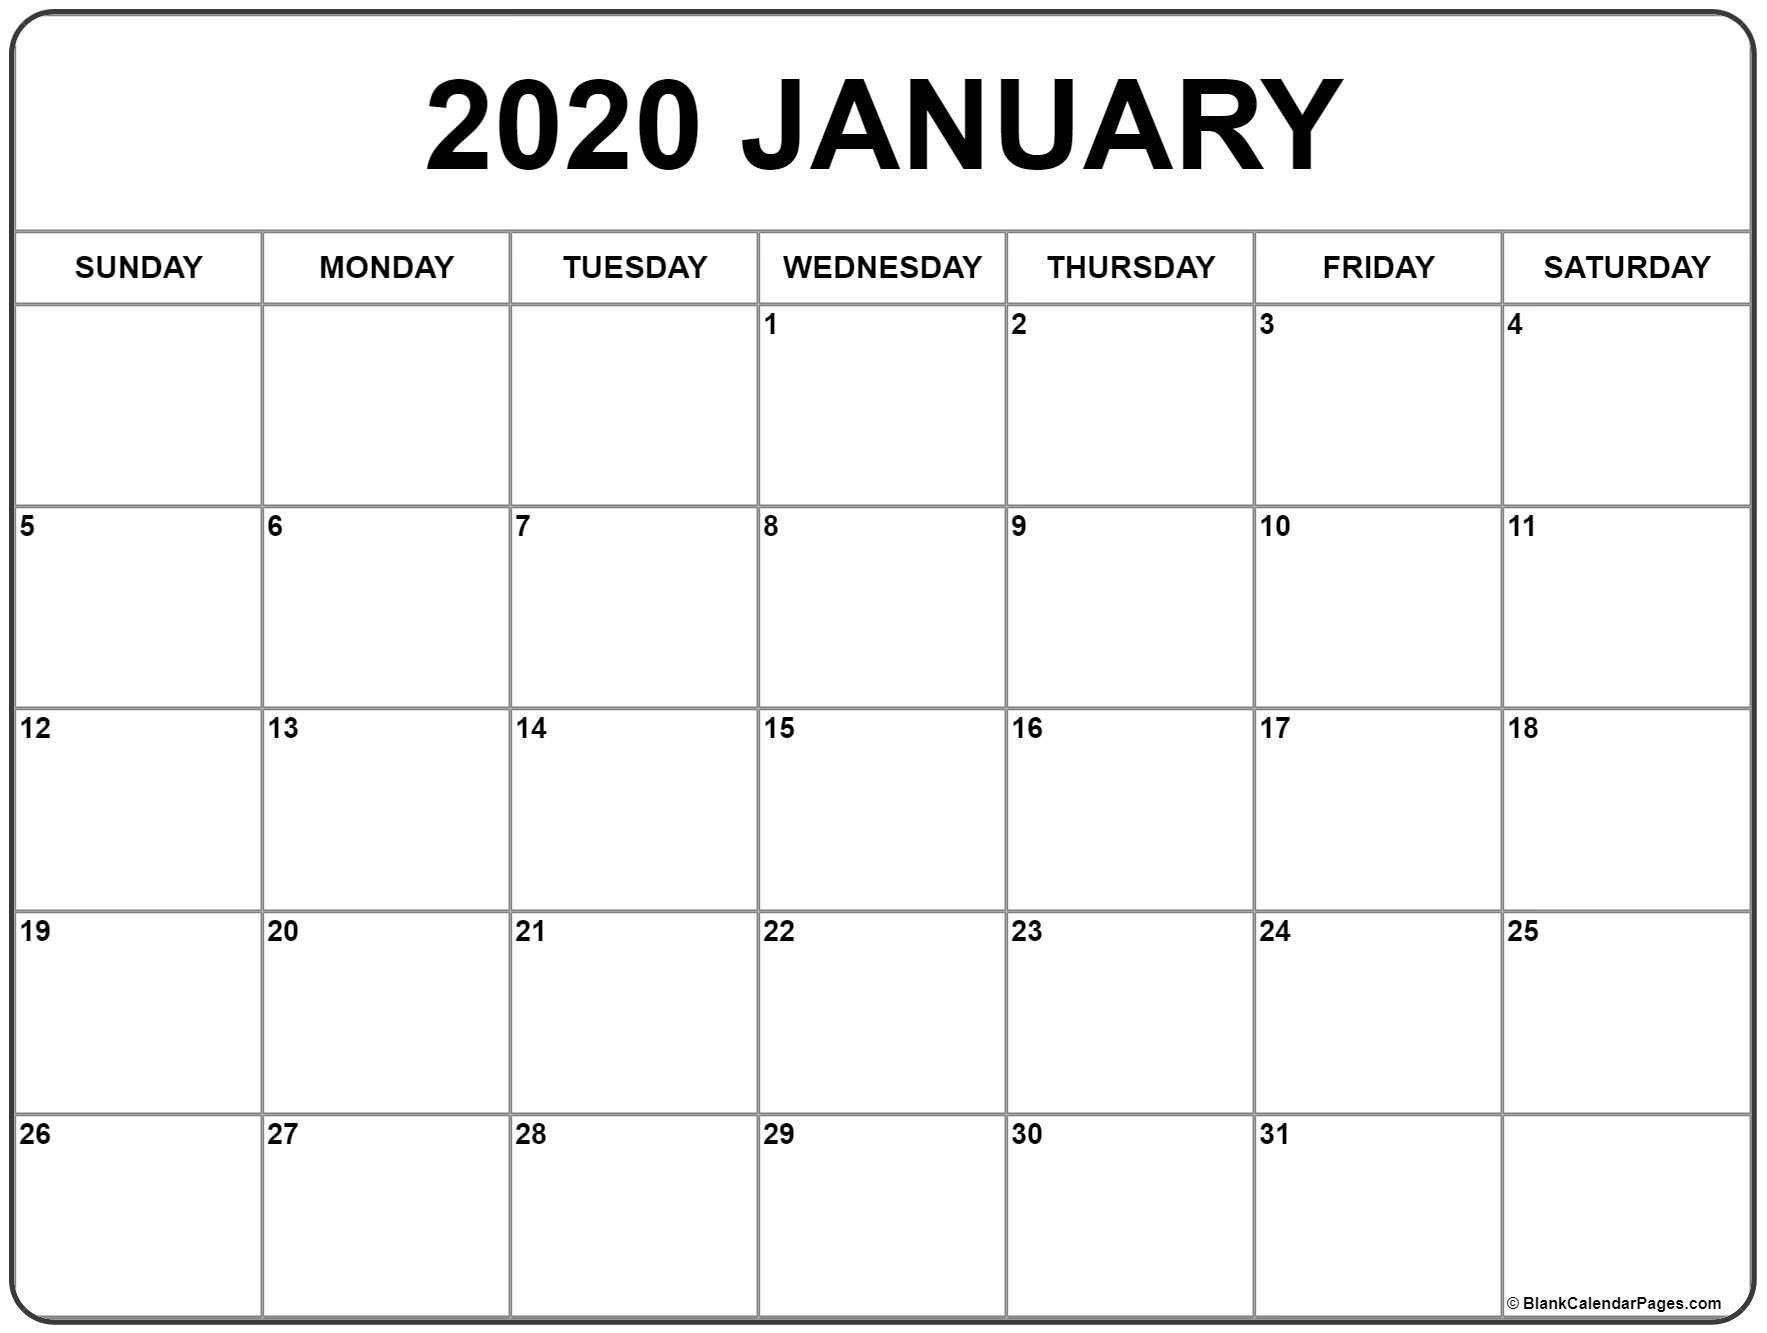 January 2020 Calendar | Free Printable Monthly Calendars-January 2020 Calendar Jpg